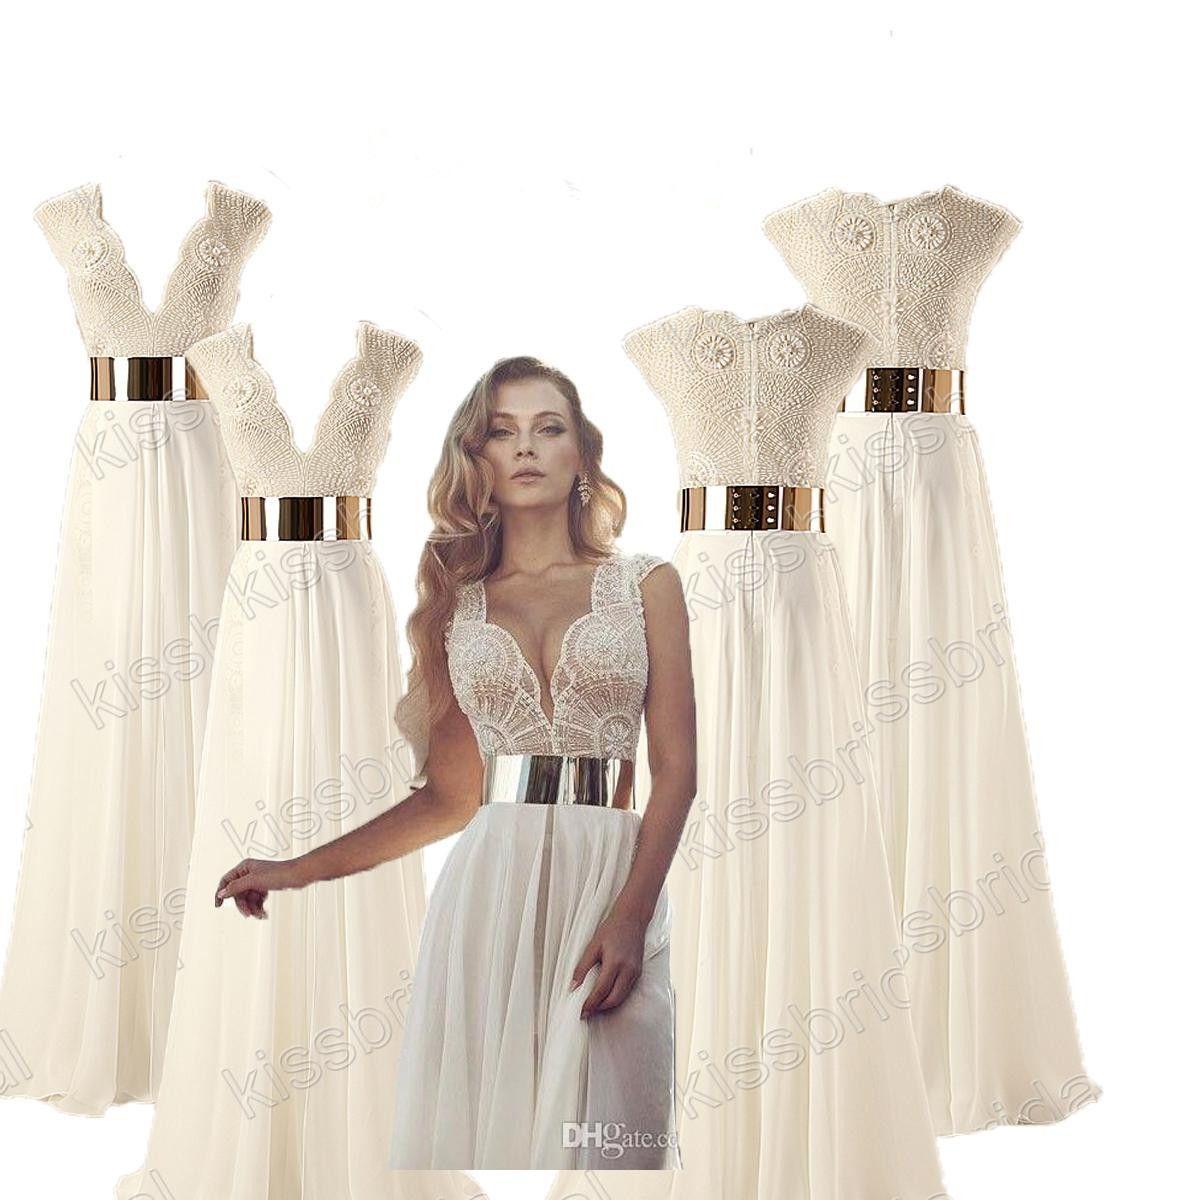 Julie Vino Beading Prom Dresses Ivory V-Neck A-Line Cap Sleeves Side Slit Chiffon 2019 Beach Evening Gowns